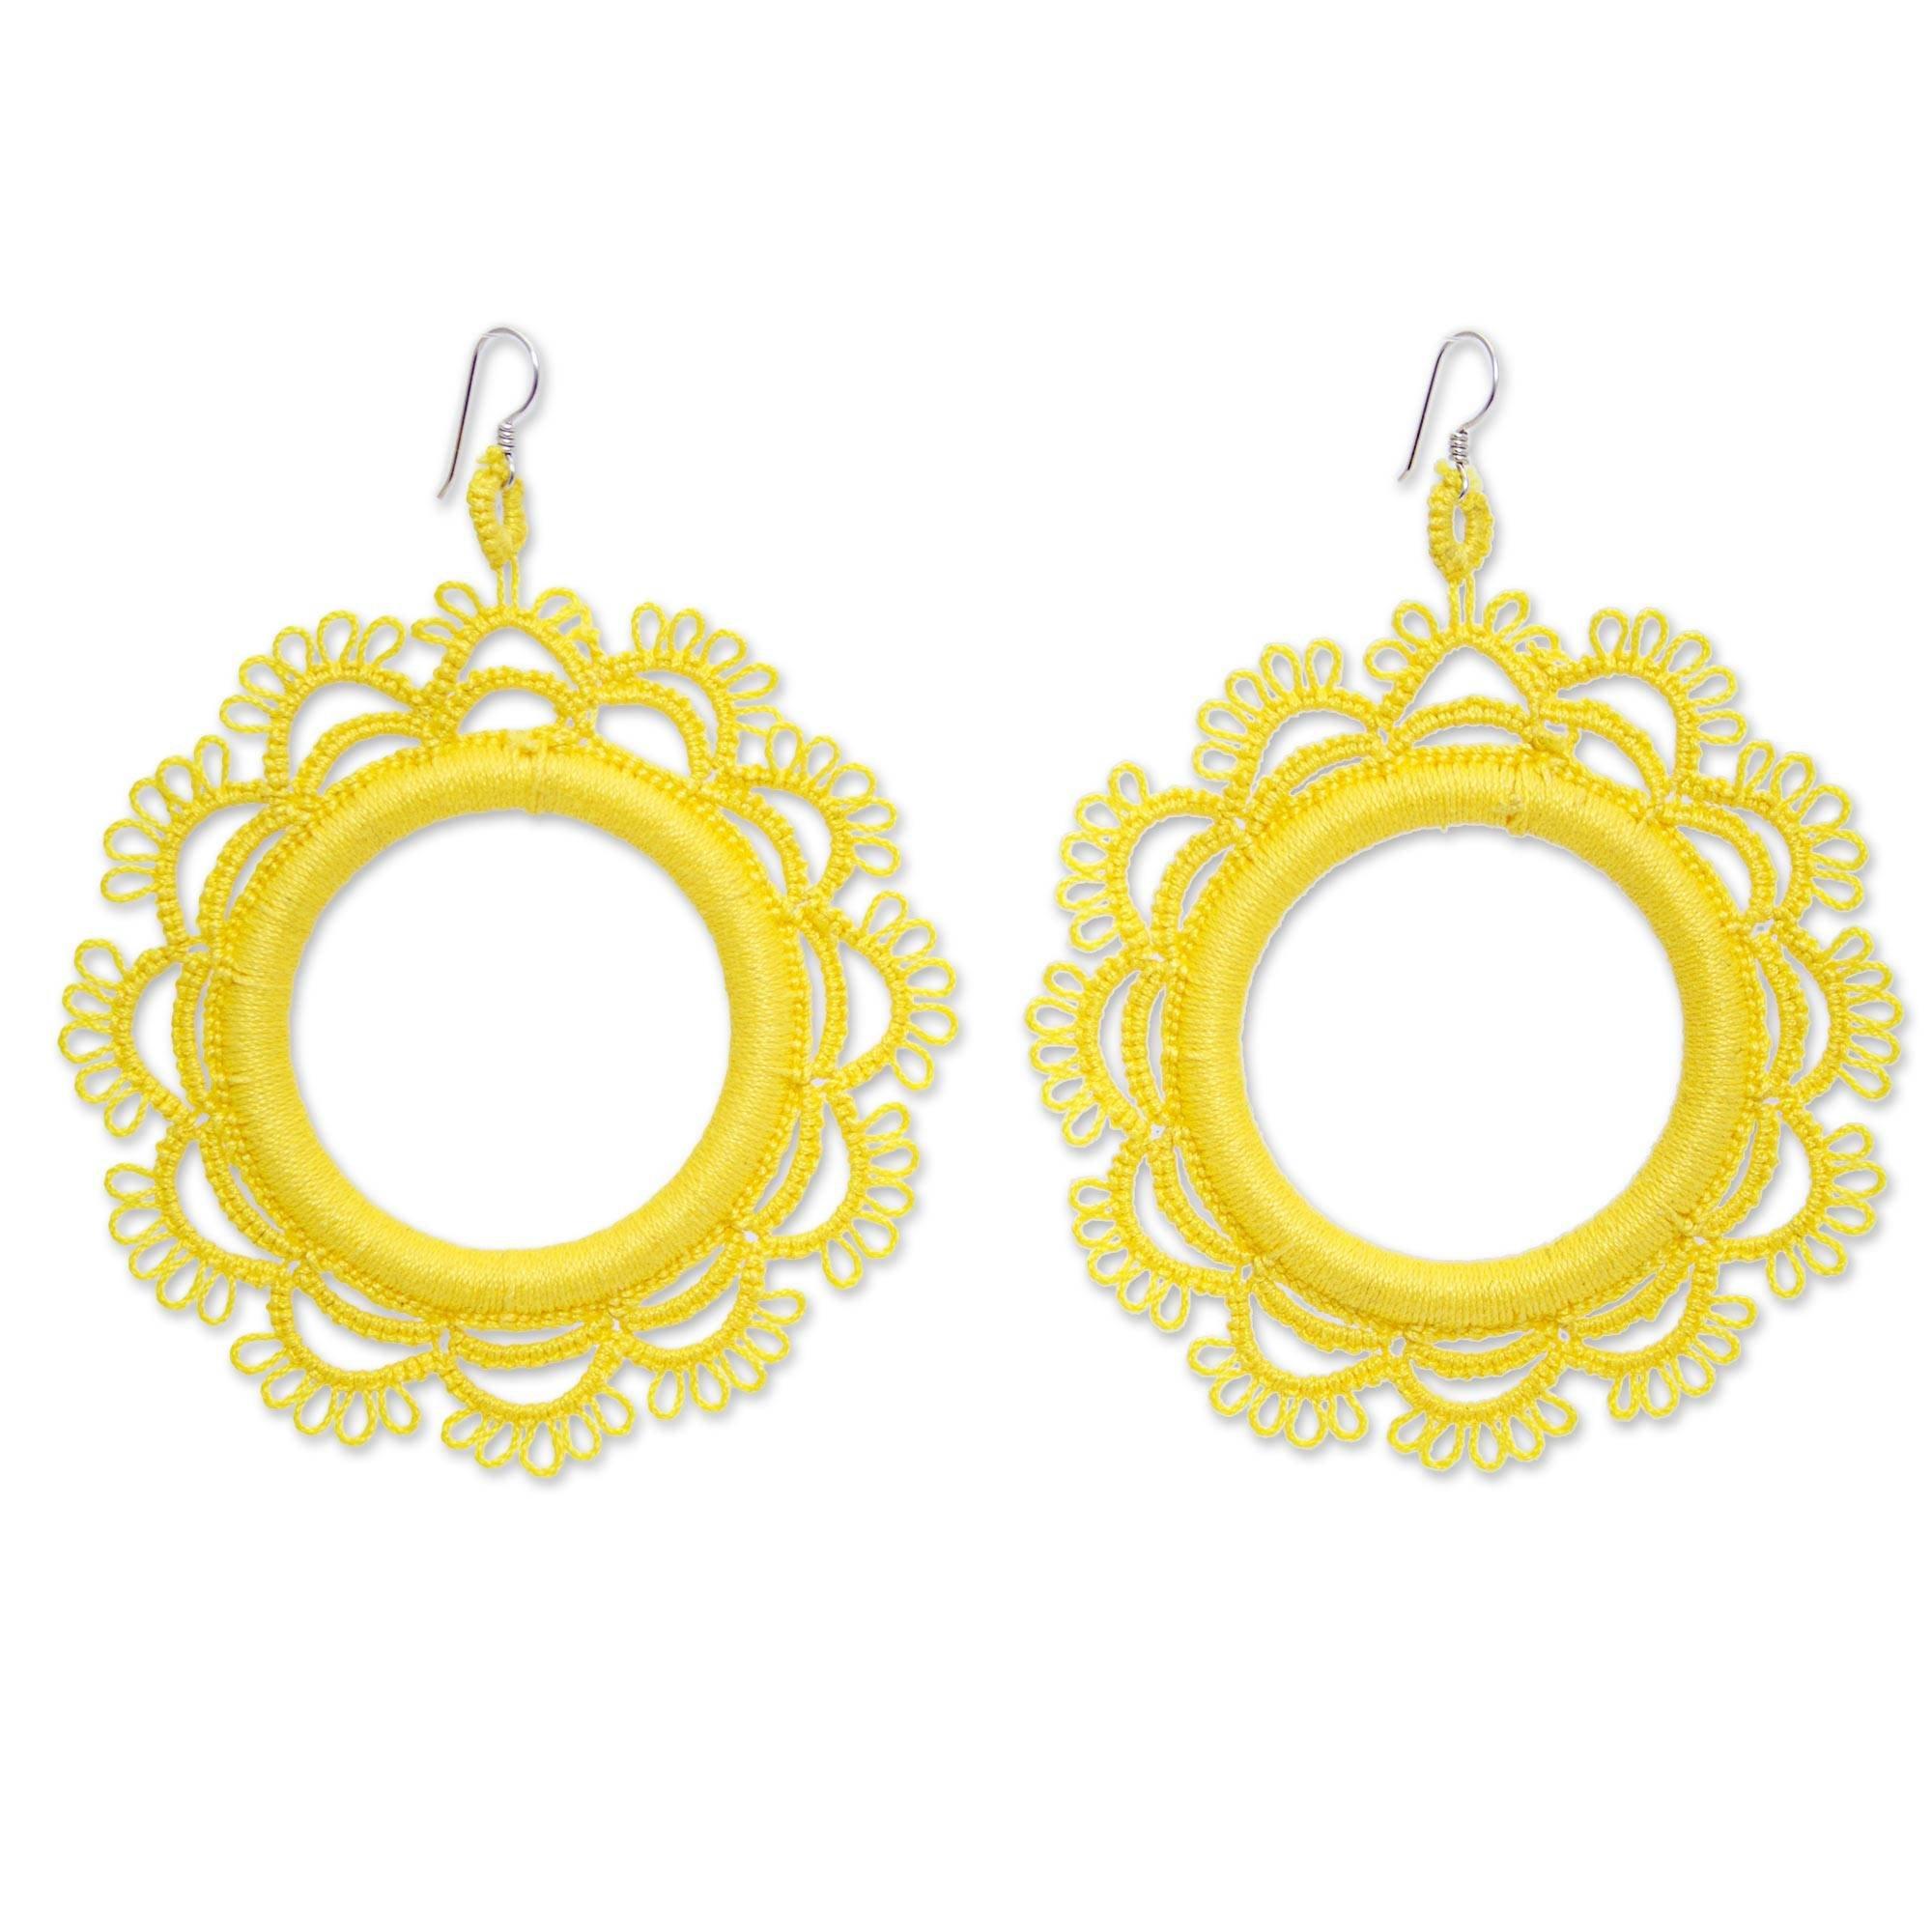 NOVICA Crochet Cotton Dangle Earrings with .925 Sterling Silver Hooks 'Yellow Sun'